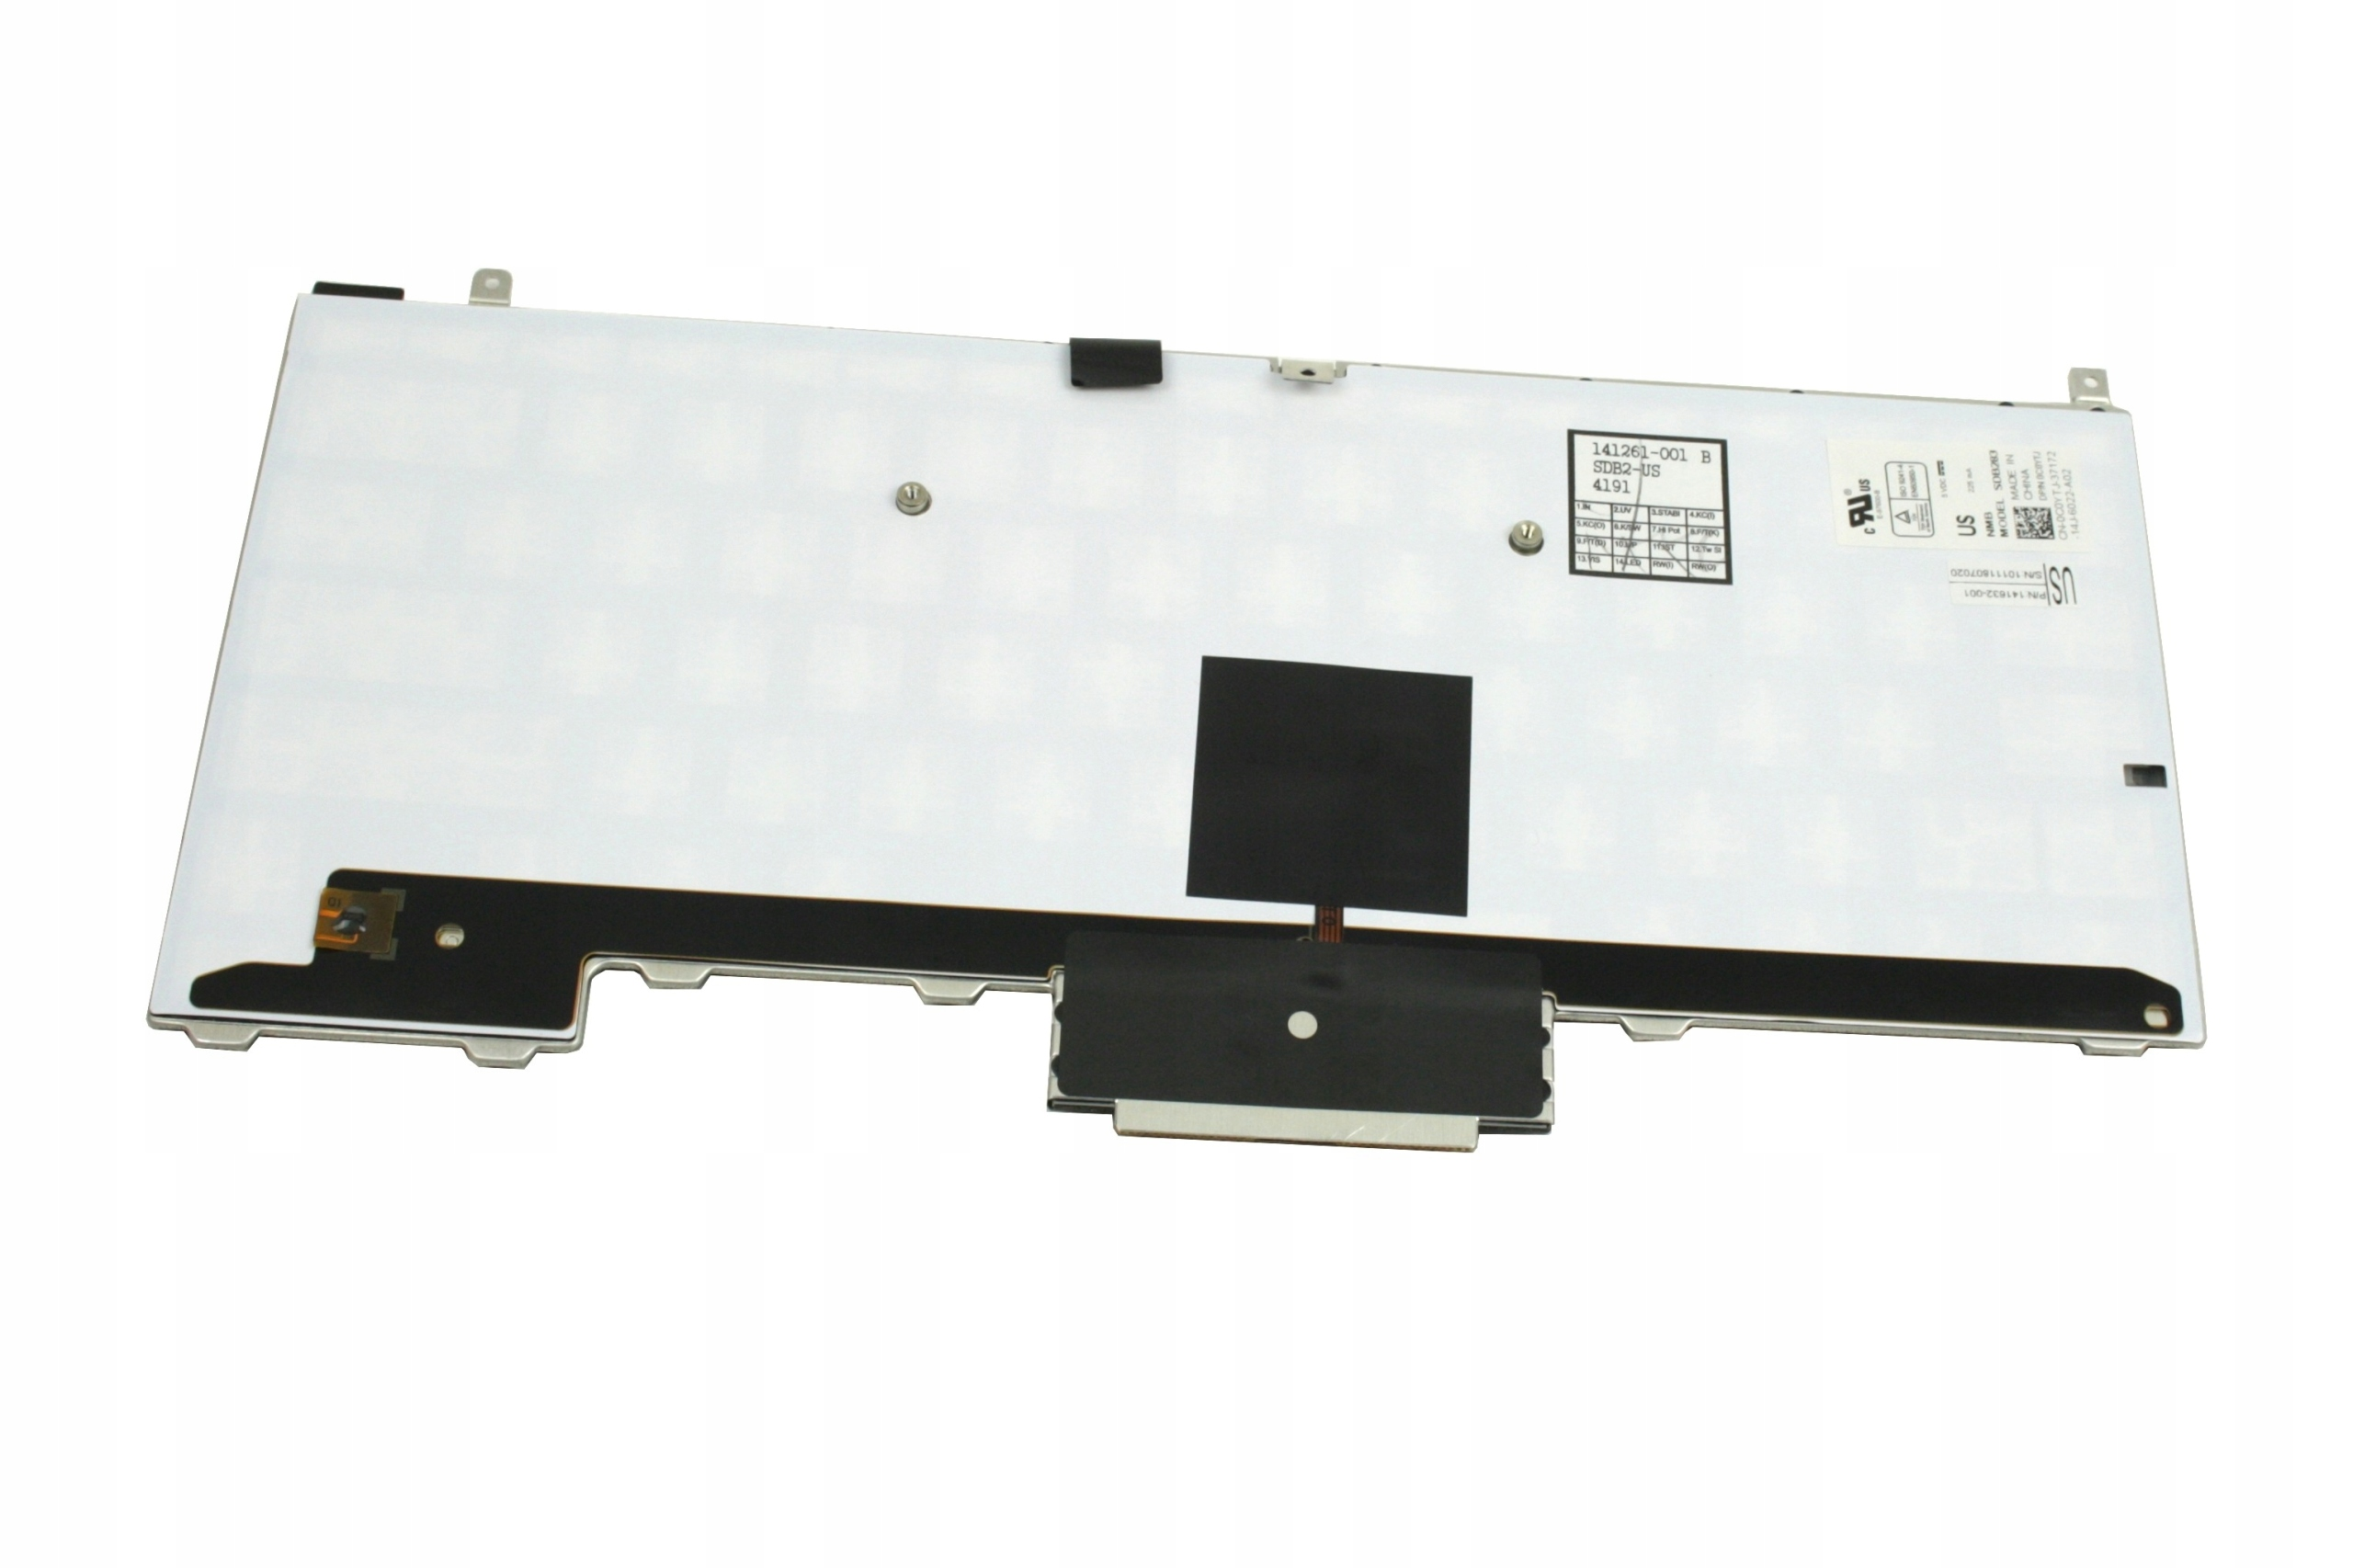 KLAWIATURA DELL LATITUDE E4310 - Klawiatury do laptopów